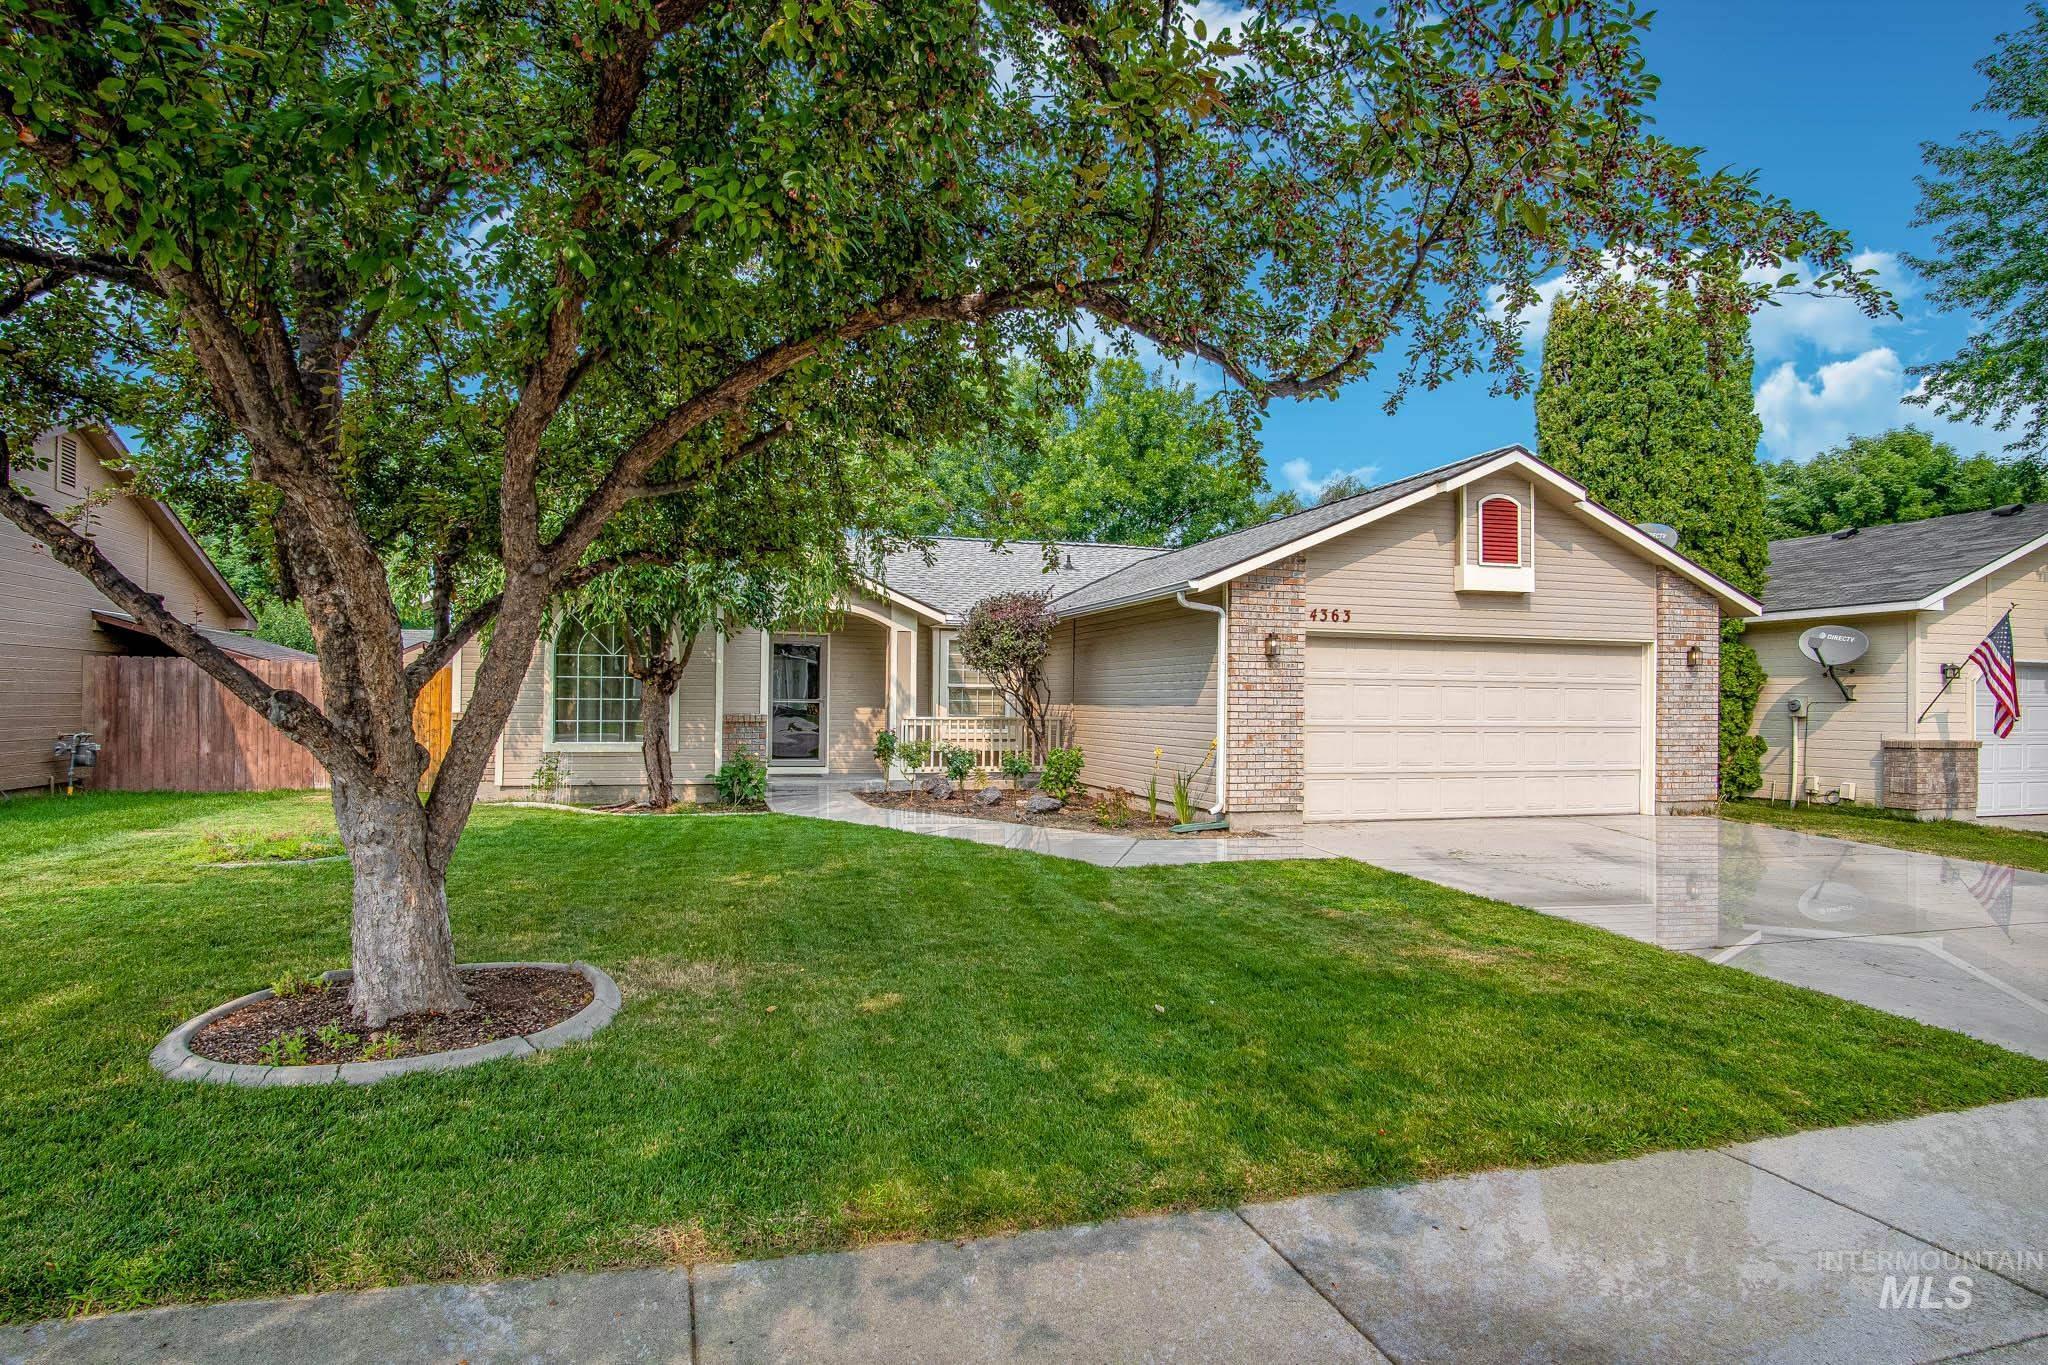 4363 S Danridge Ave Property Photo